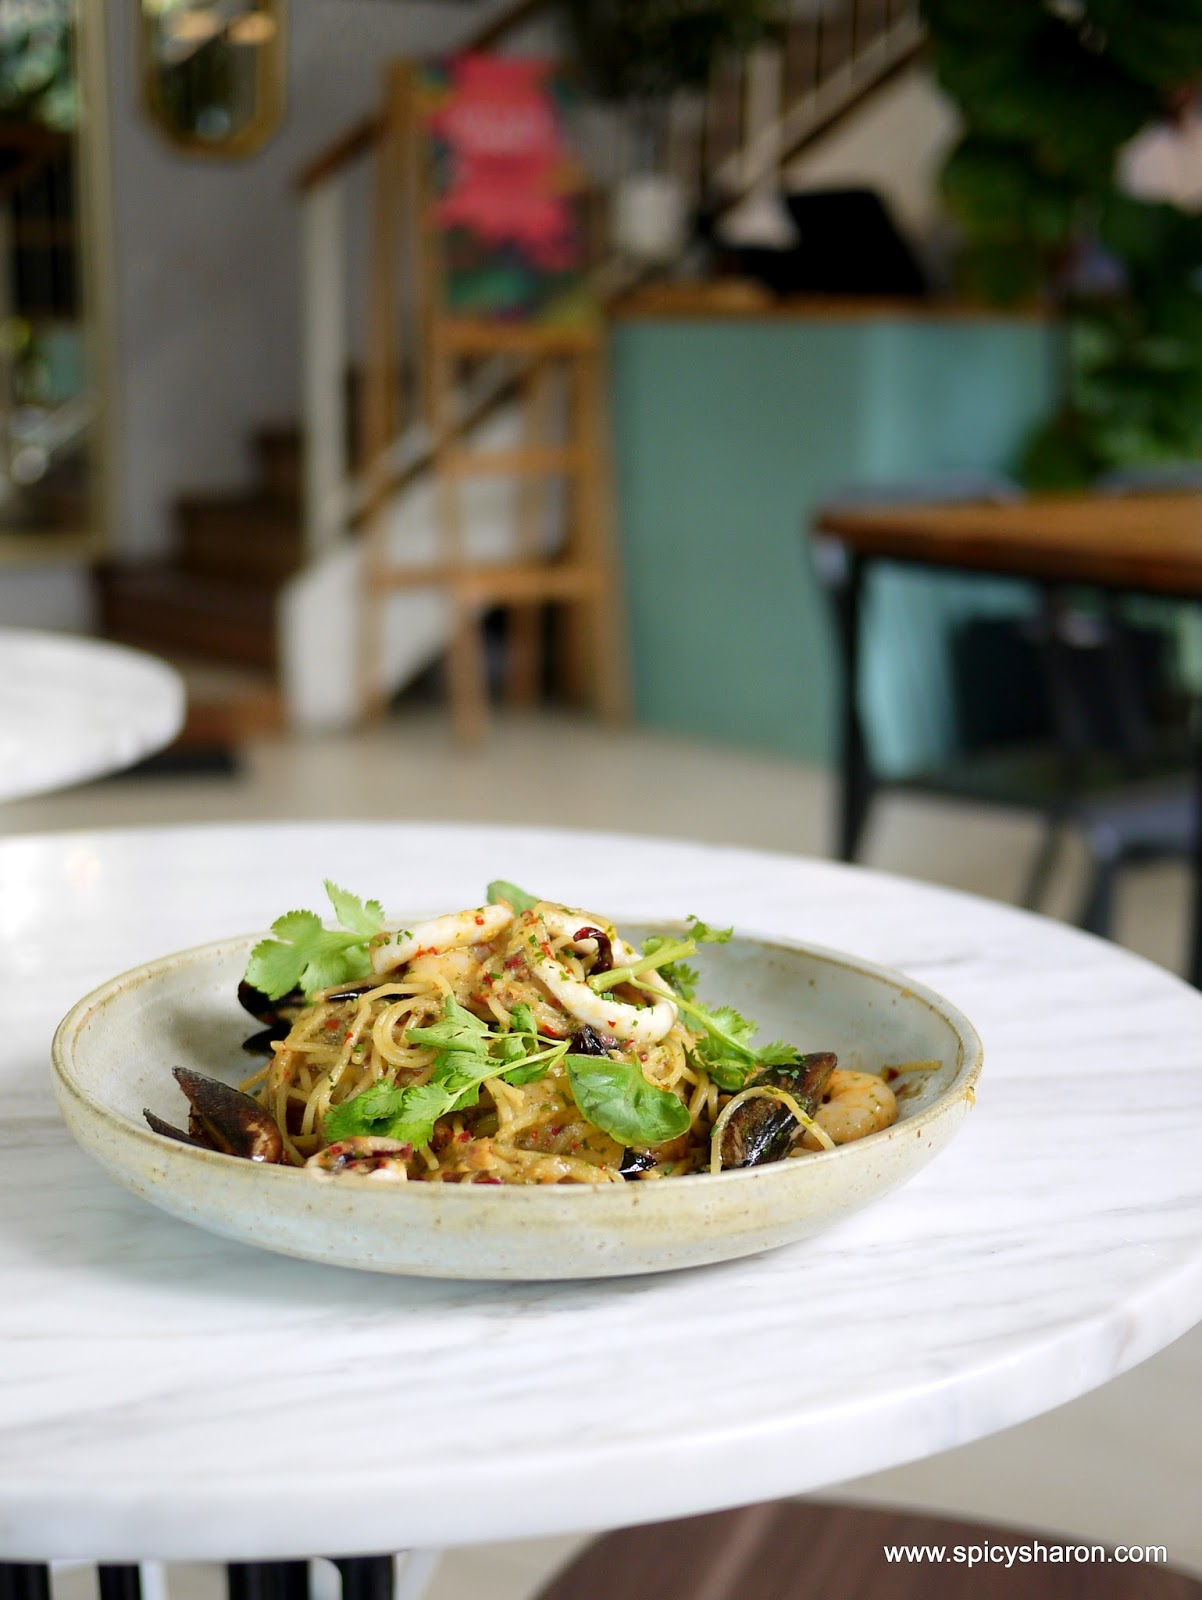 Rimba rusa sunway nexis kota damansara pj beautiful for Food bar kota damansara